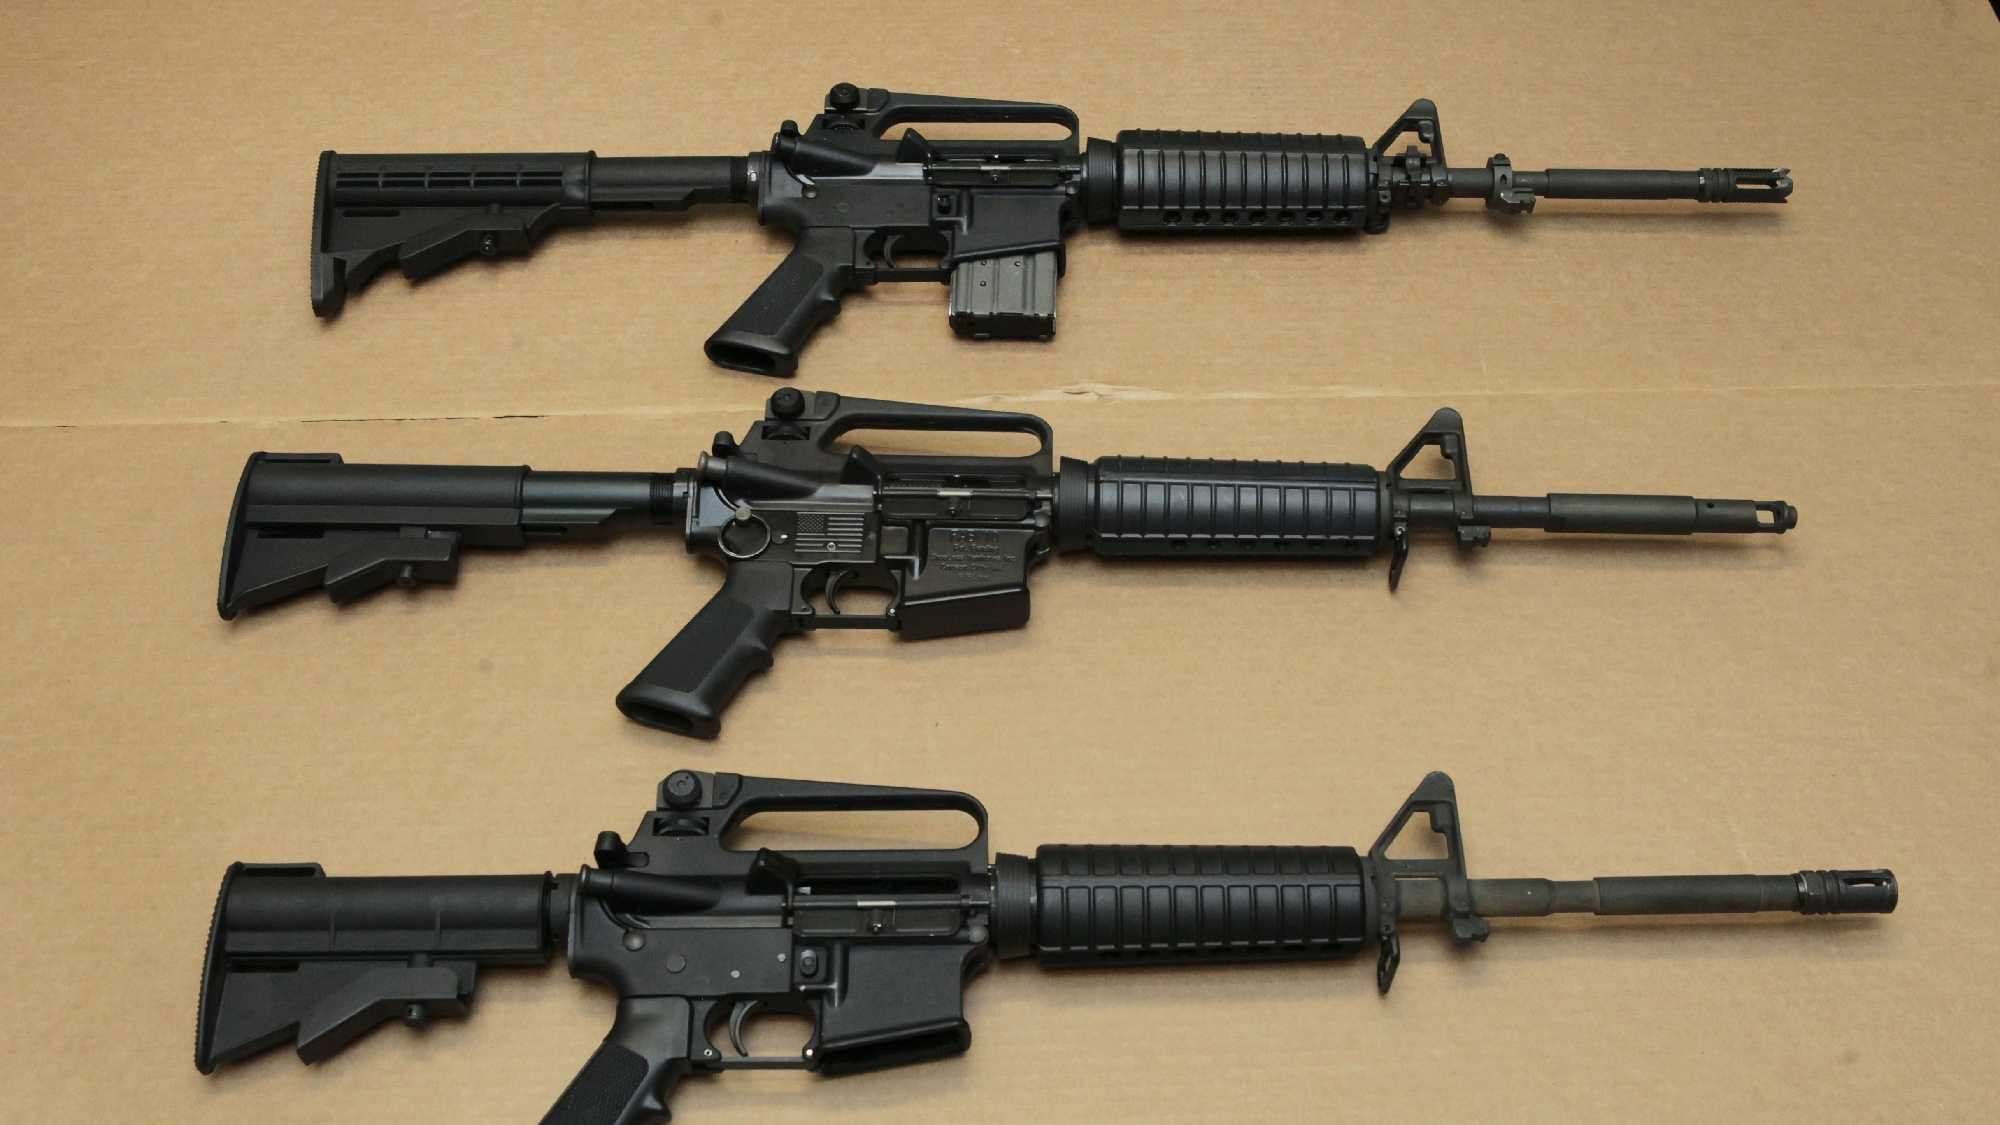 Assault rifles in CA DOJ